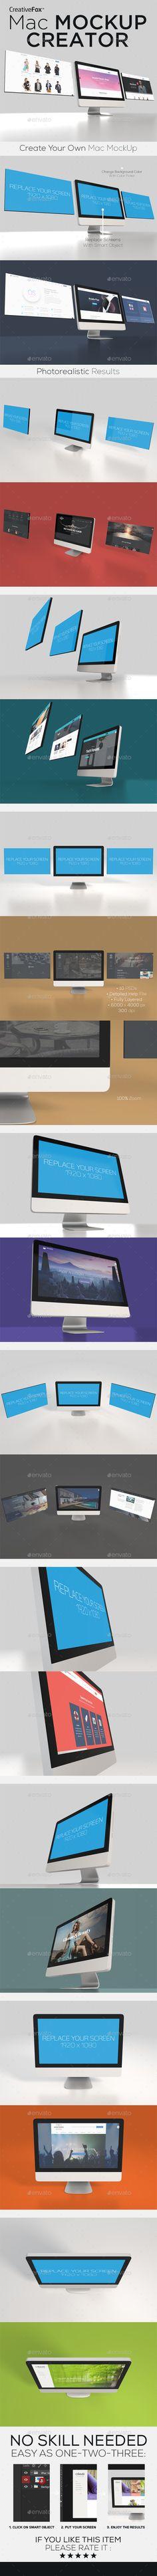 Mac Mockup Creator #design Download: http://graphicriver.net/item/mac-mockup-creator/14506076?ref=ksioks